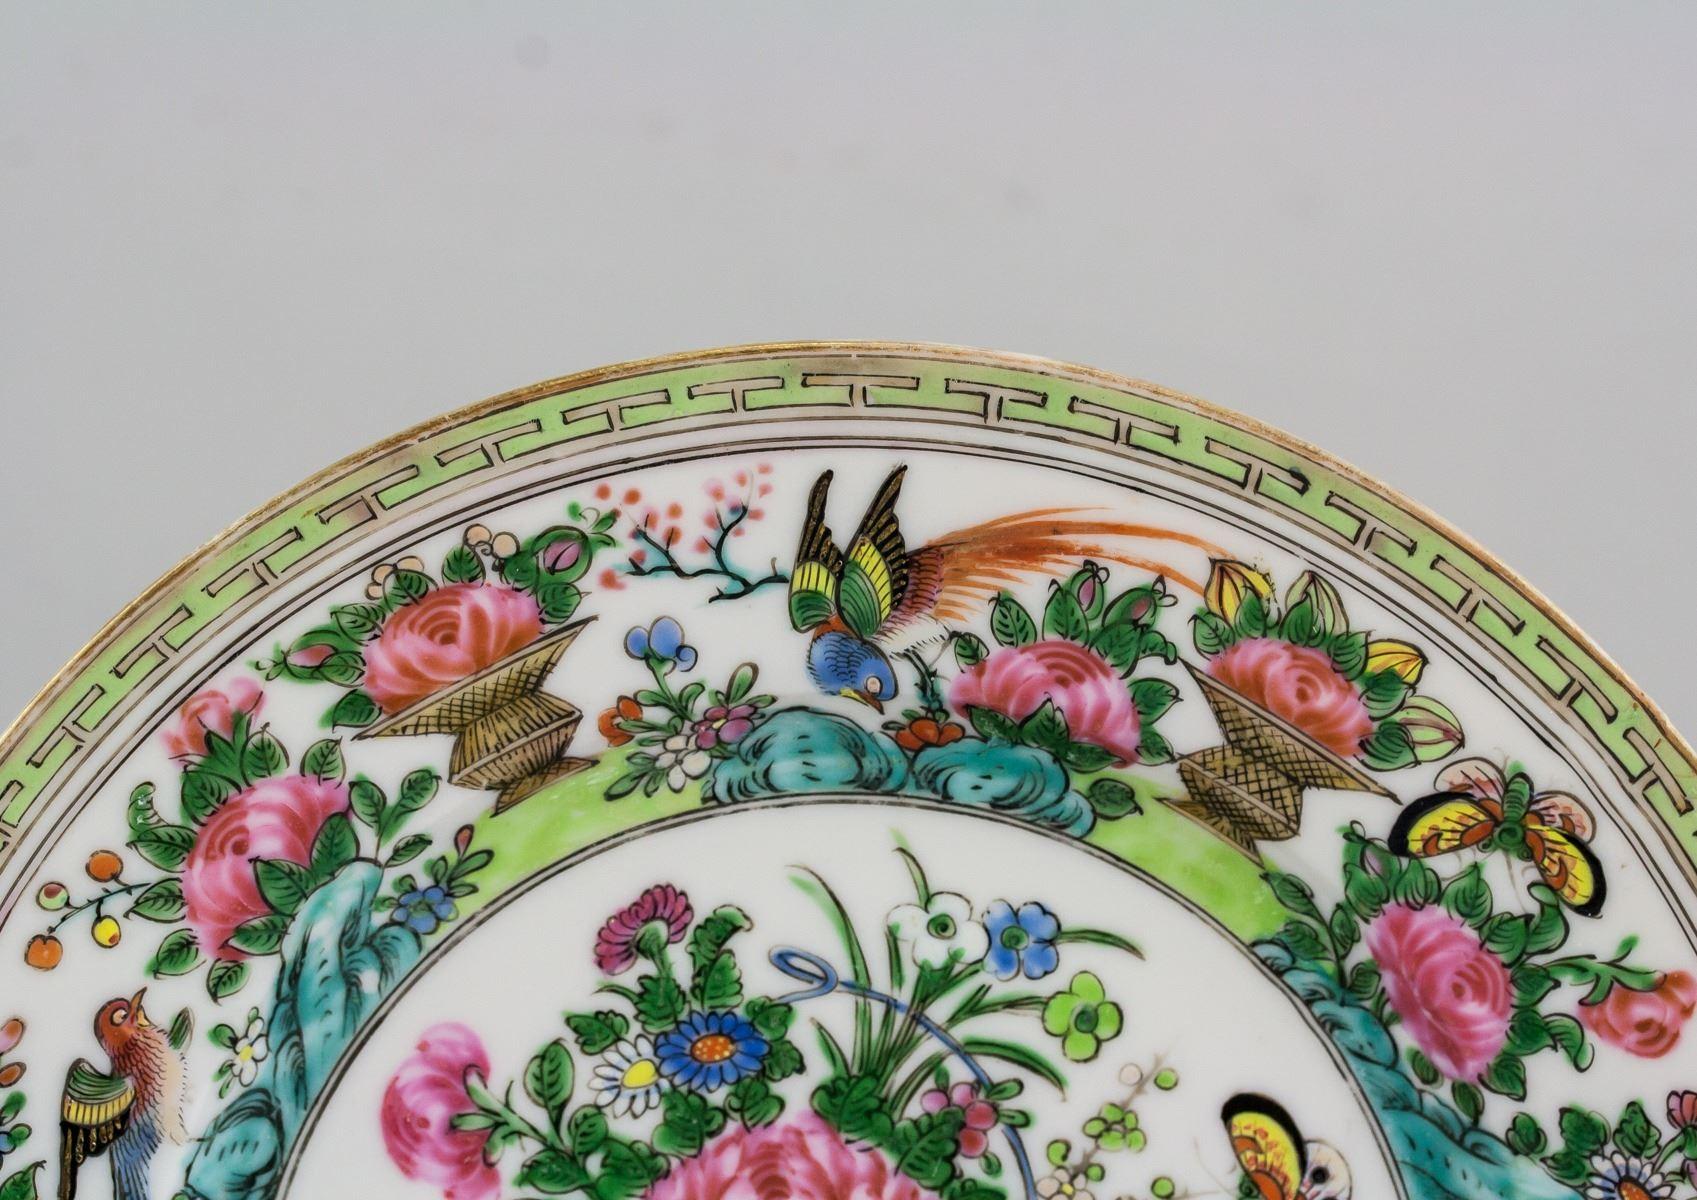 Chinese Canton Enamel Porcelain Plate